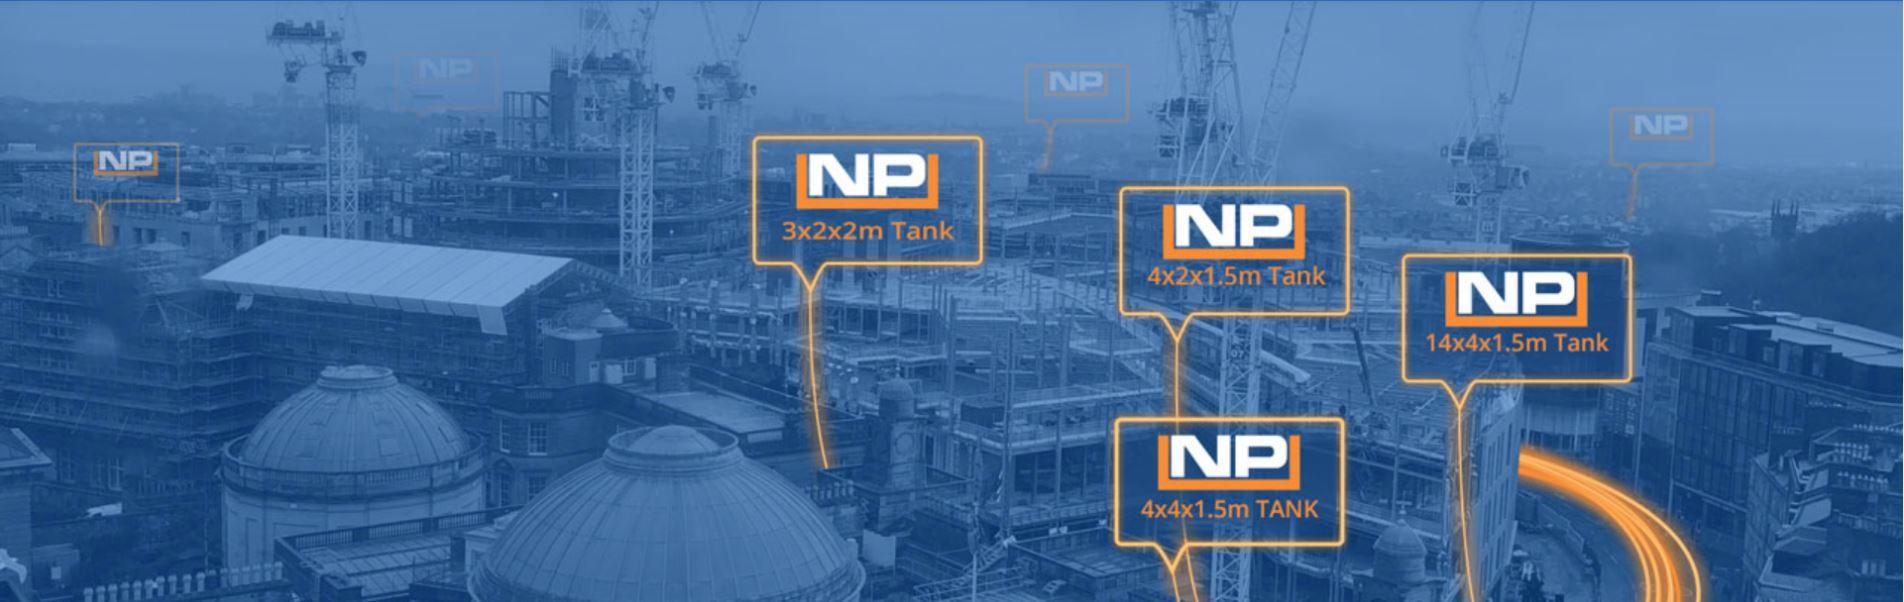 Nicholson Plastics GRP Tanks